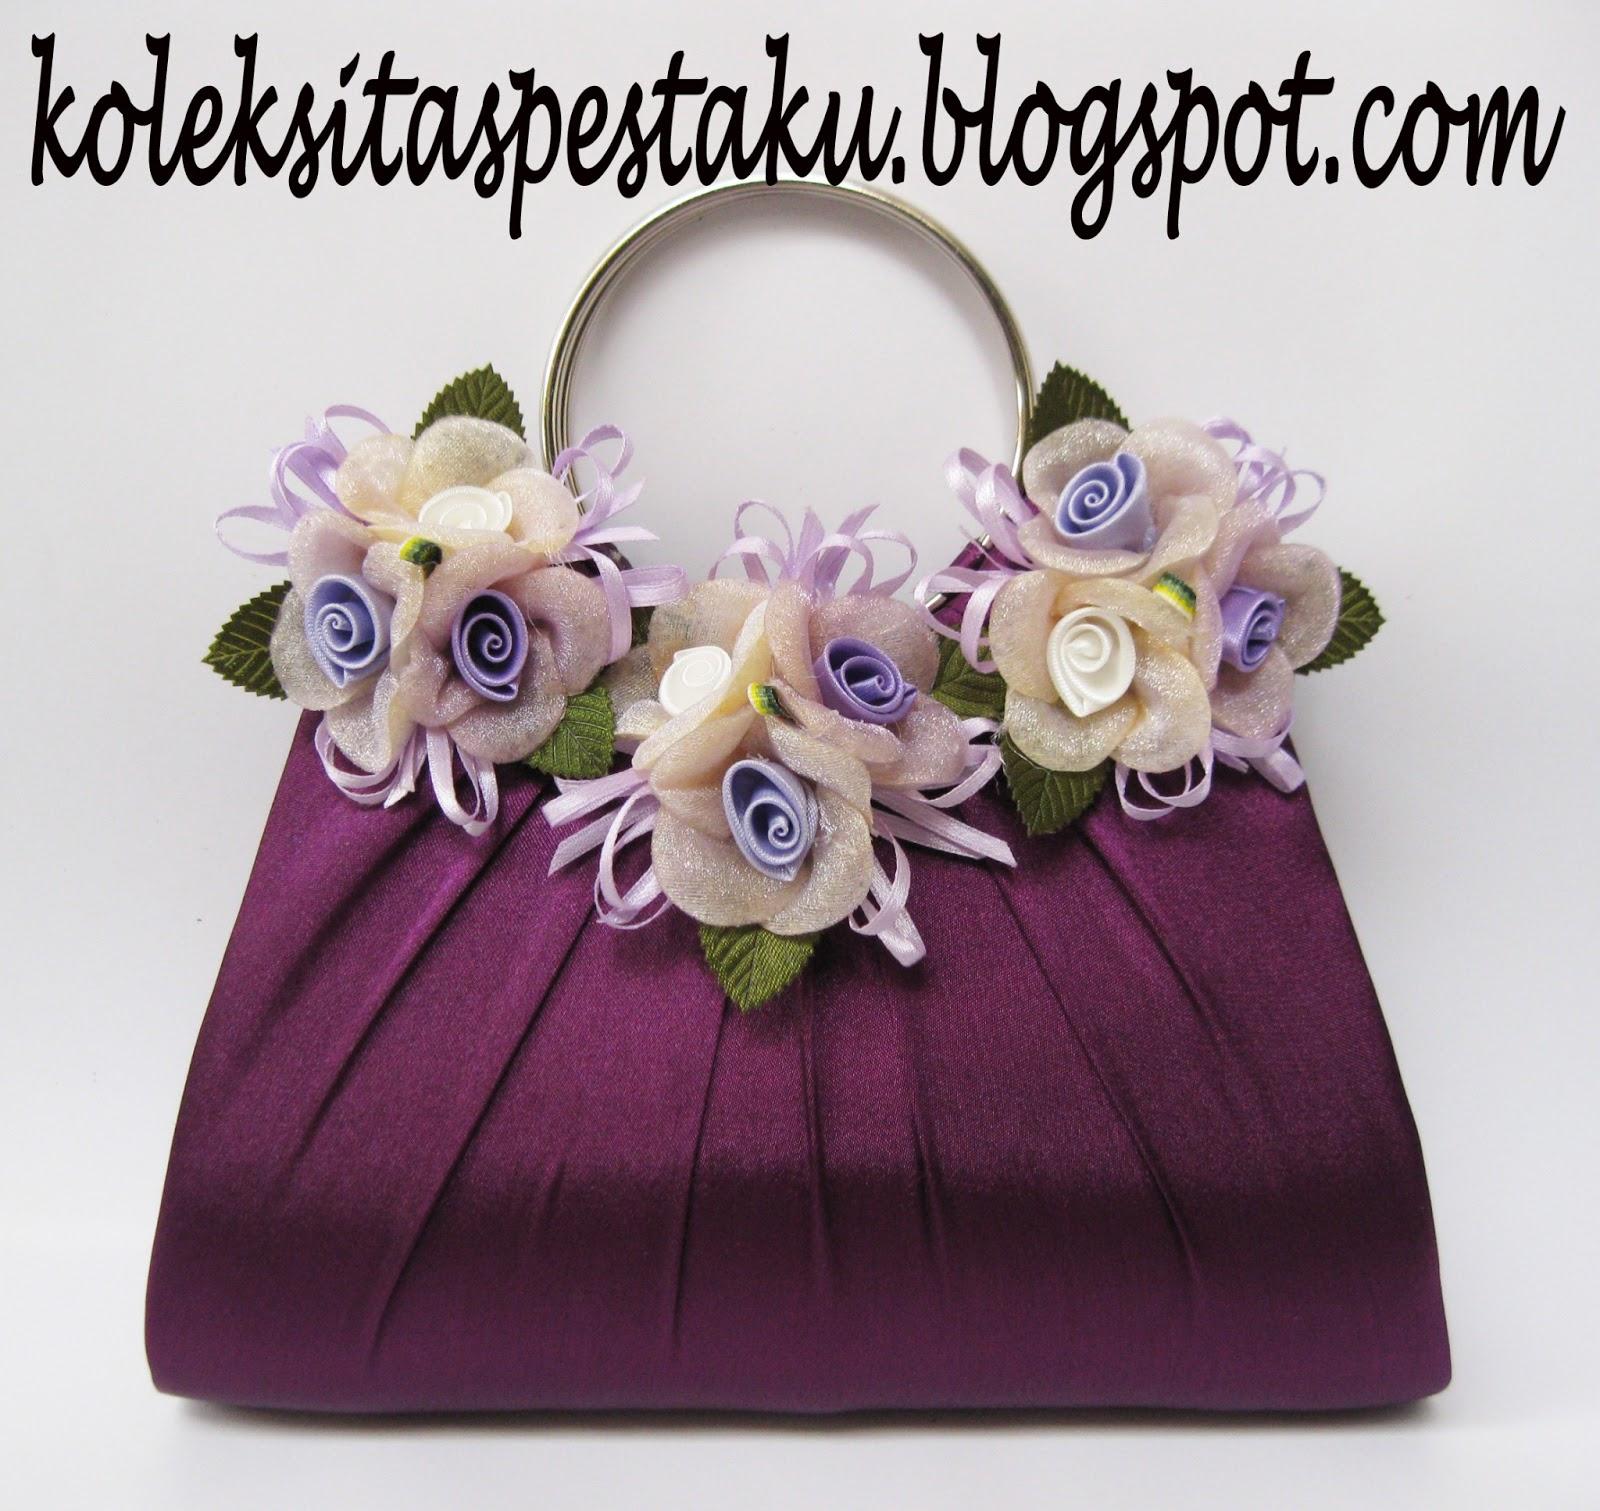 Clutch Bag-Tas Pesta Ready Terbaru Warna Purple dengan Bunga Cantik Hanya  ada di OnlineShop TasPestaKu (SOLD OUT) 17333d68e2